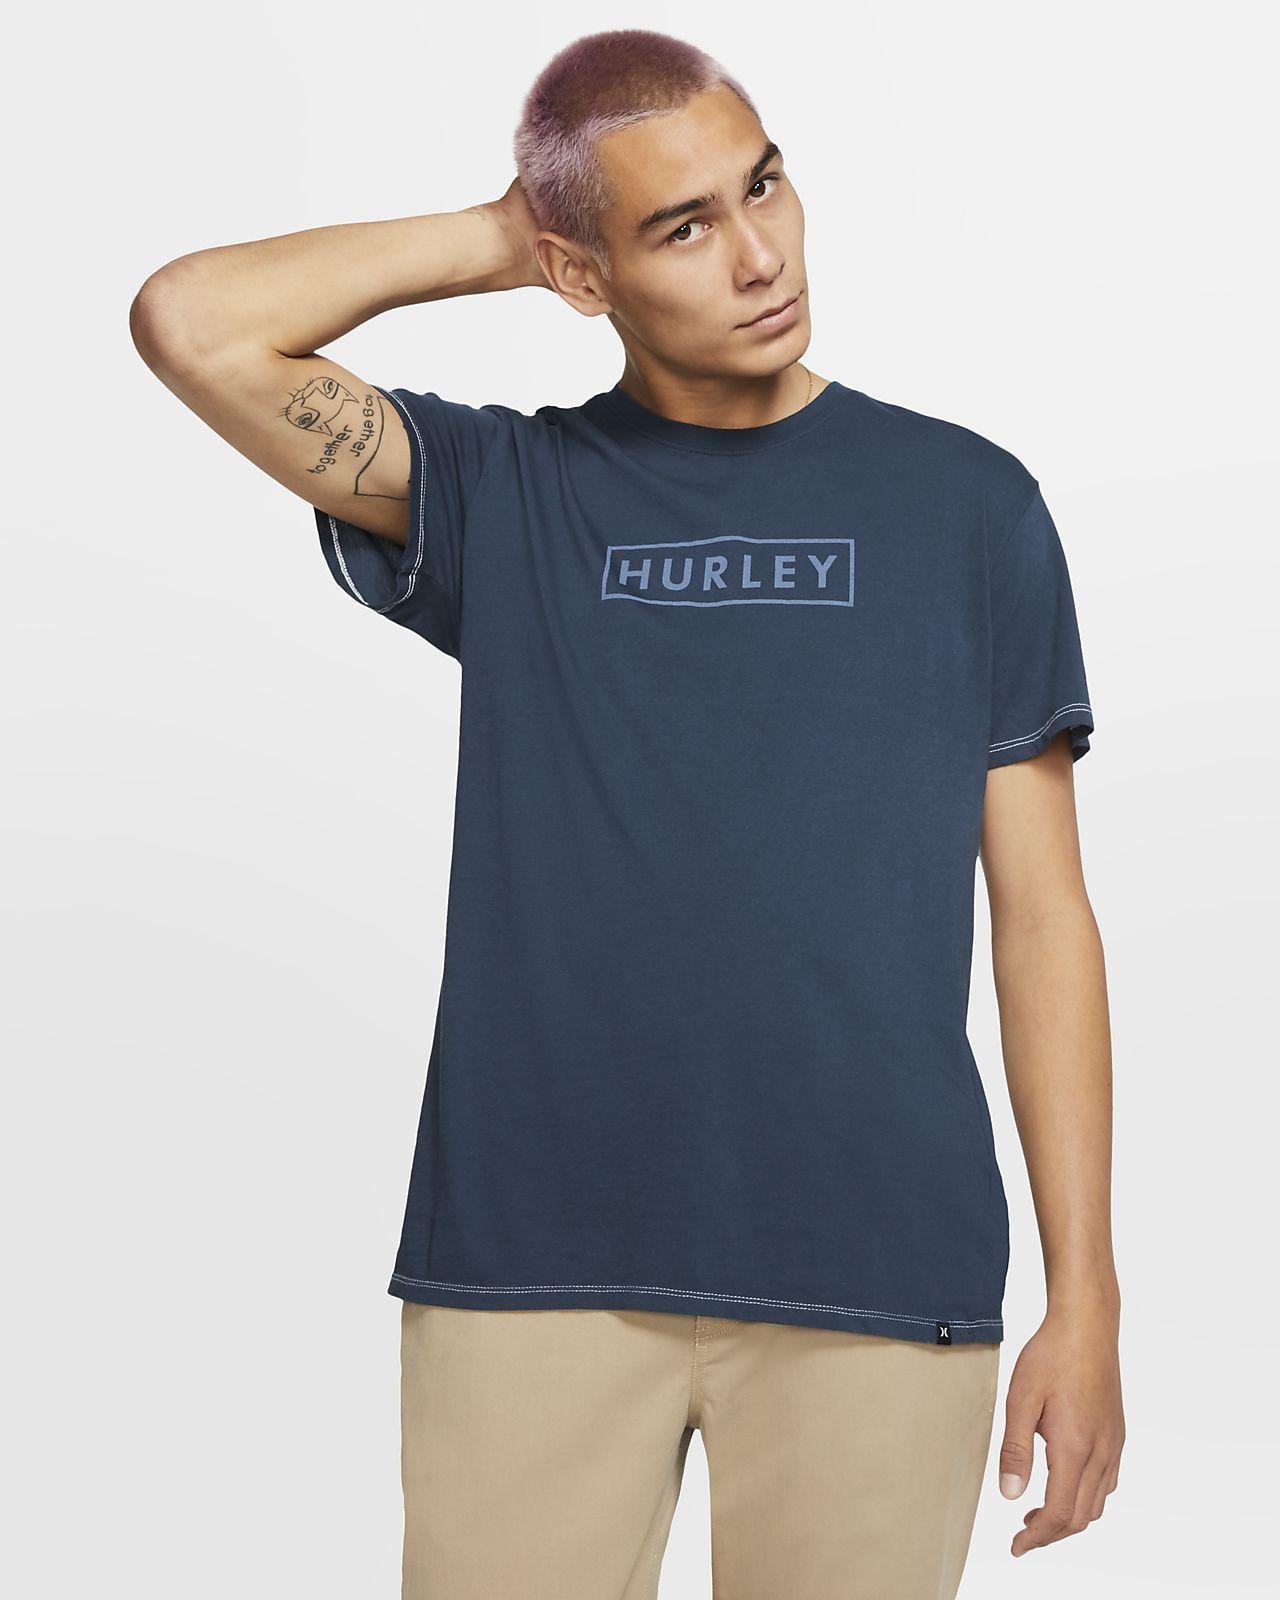 Hurley Boxed Men's T-Shirt